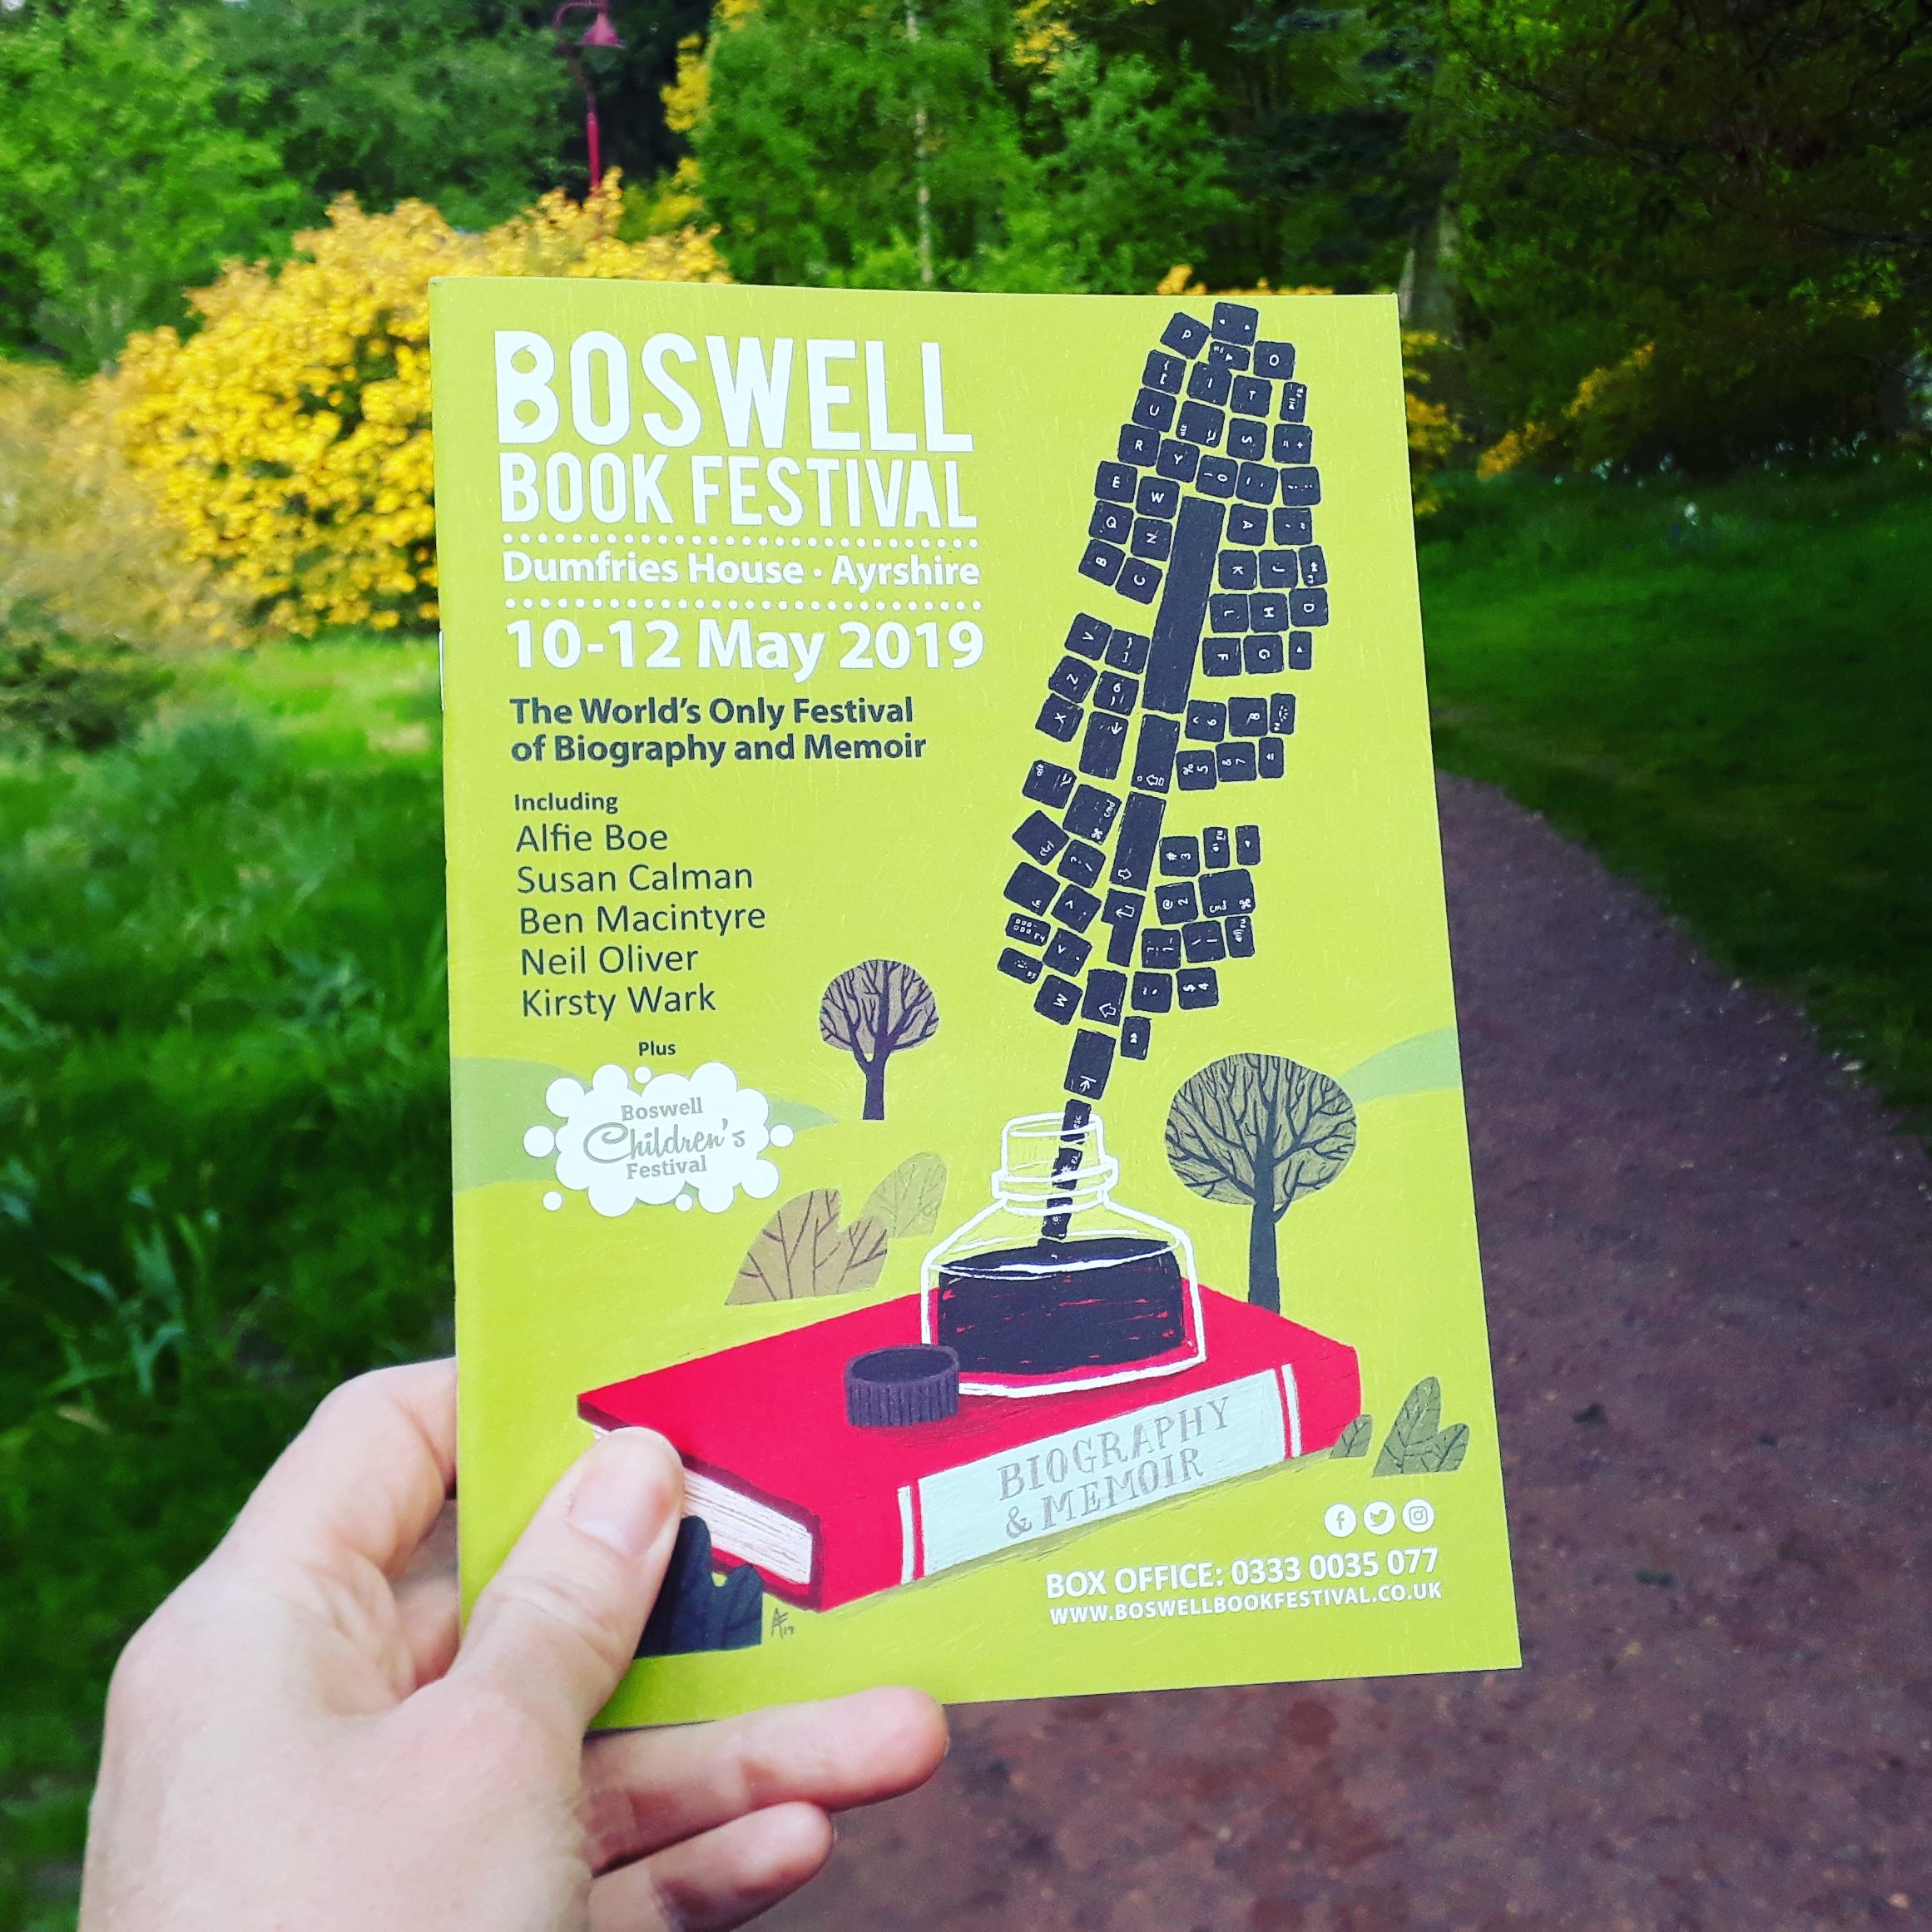 Boswell Book Festival